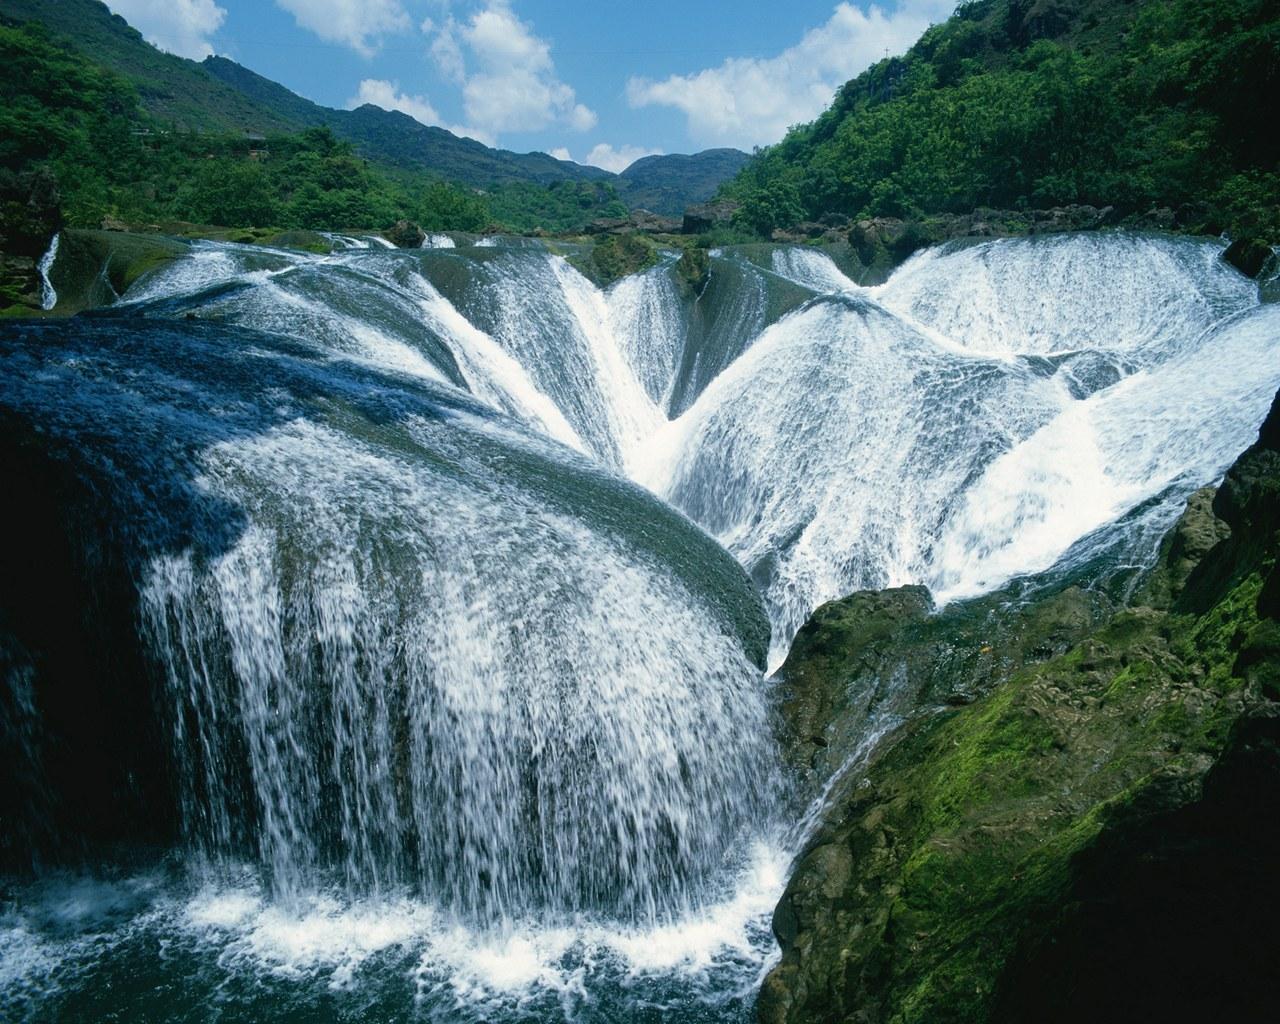 http://4.bp.blogspot.com/-rCNyVwd3hrQ/T-8QEZ1OjMI/AAAAAAAAGSQ/8tsYwuvi4nw/s1600/amazing-landscape-06.jpg